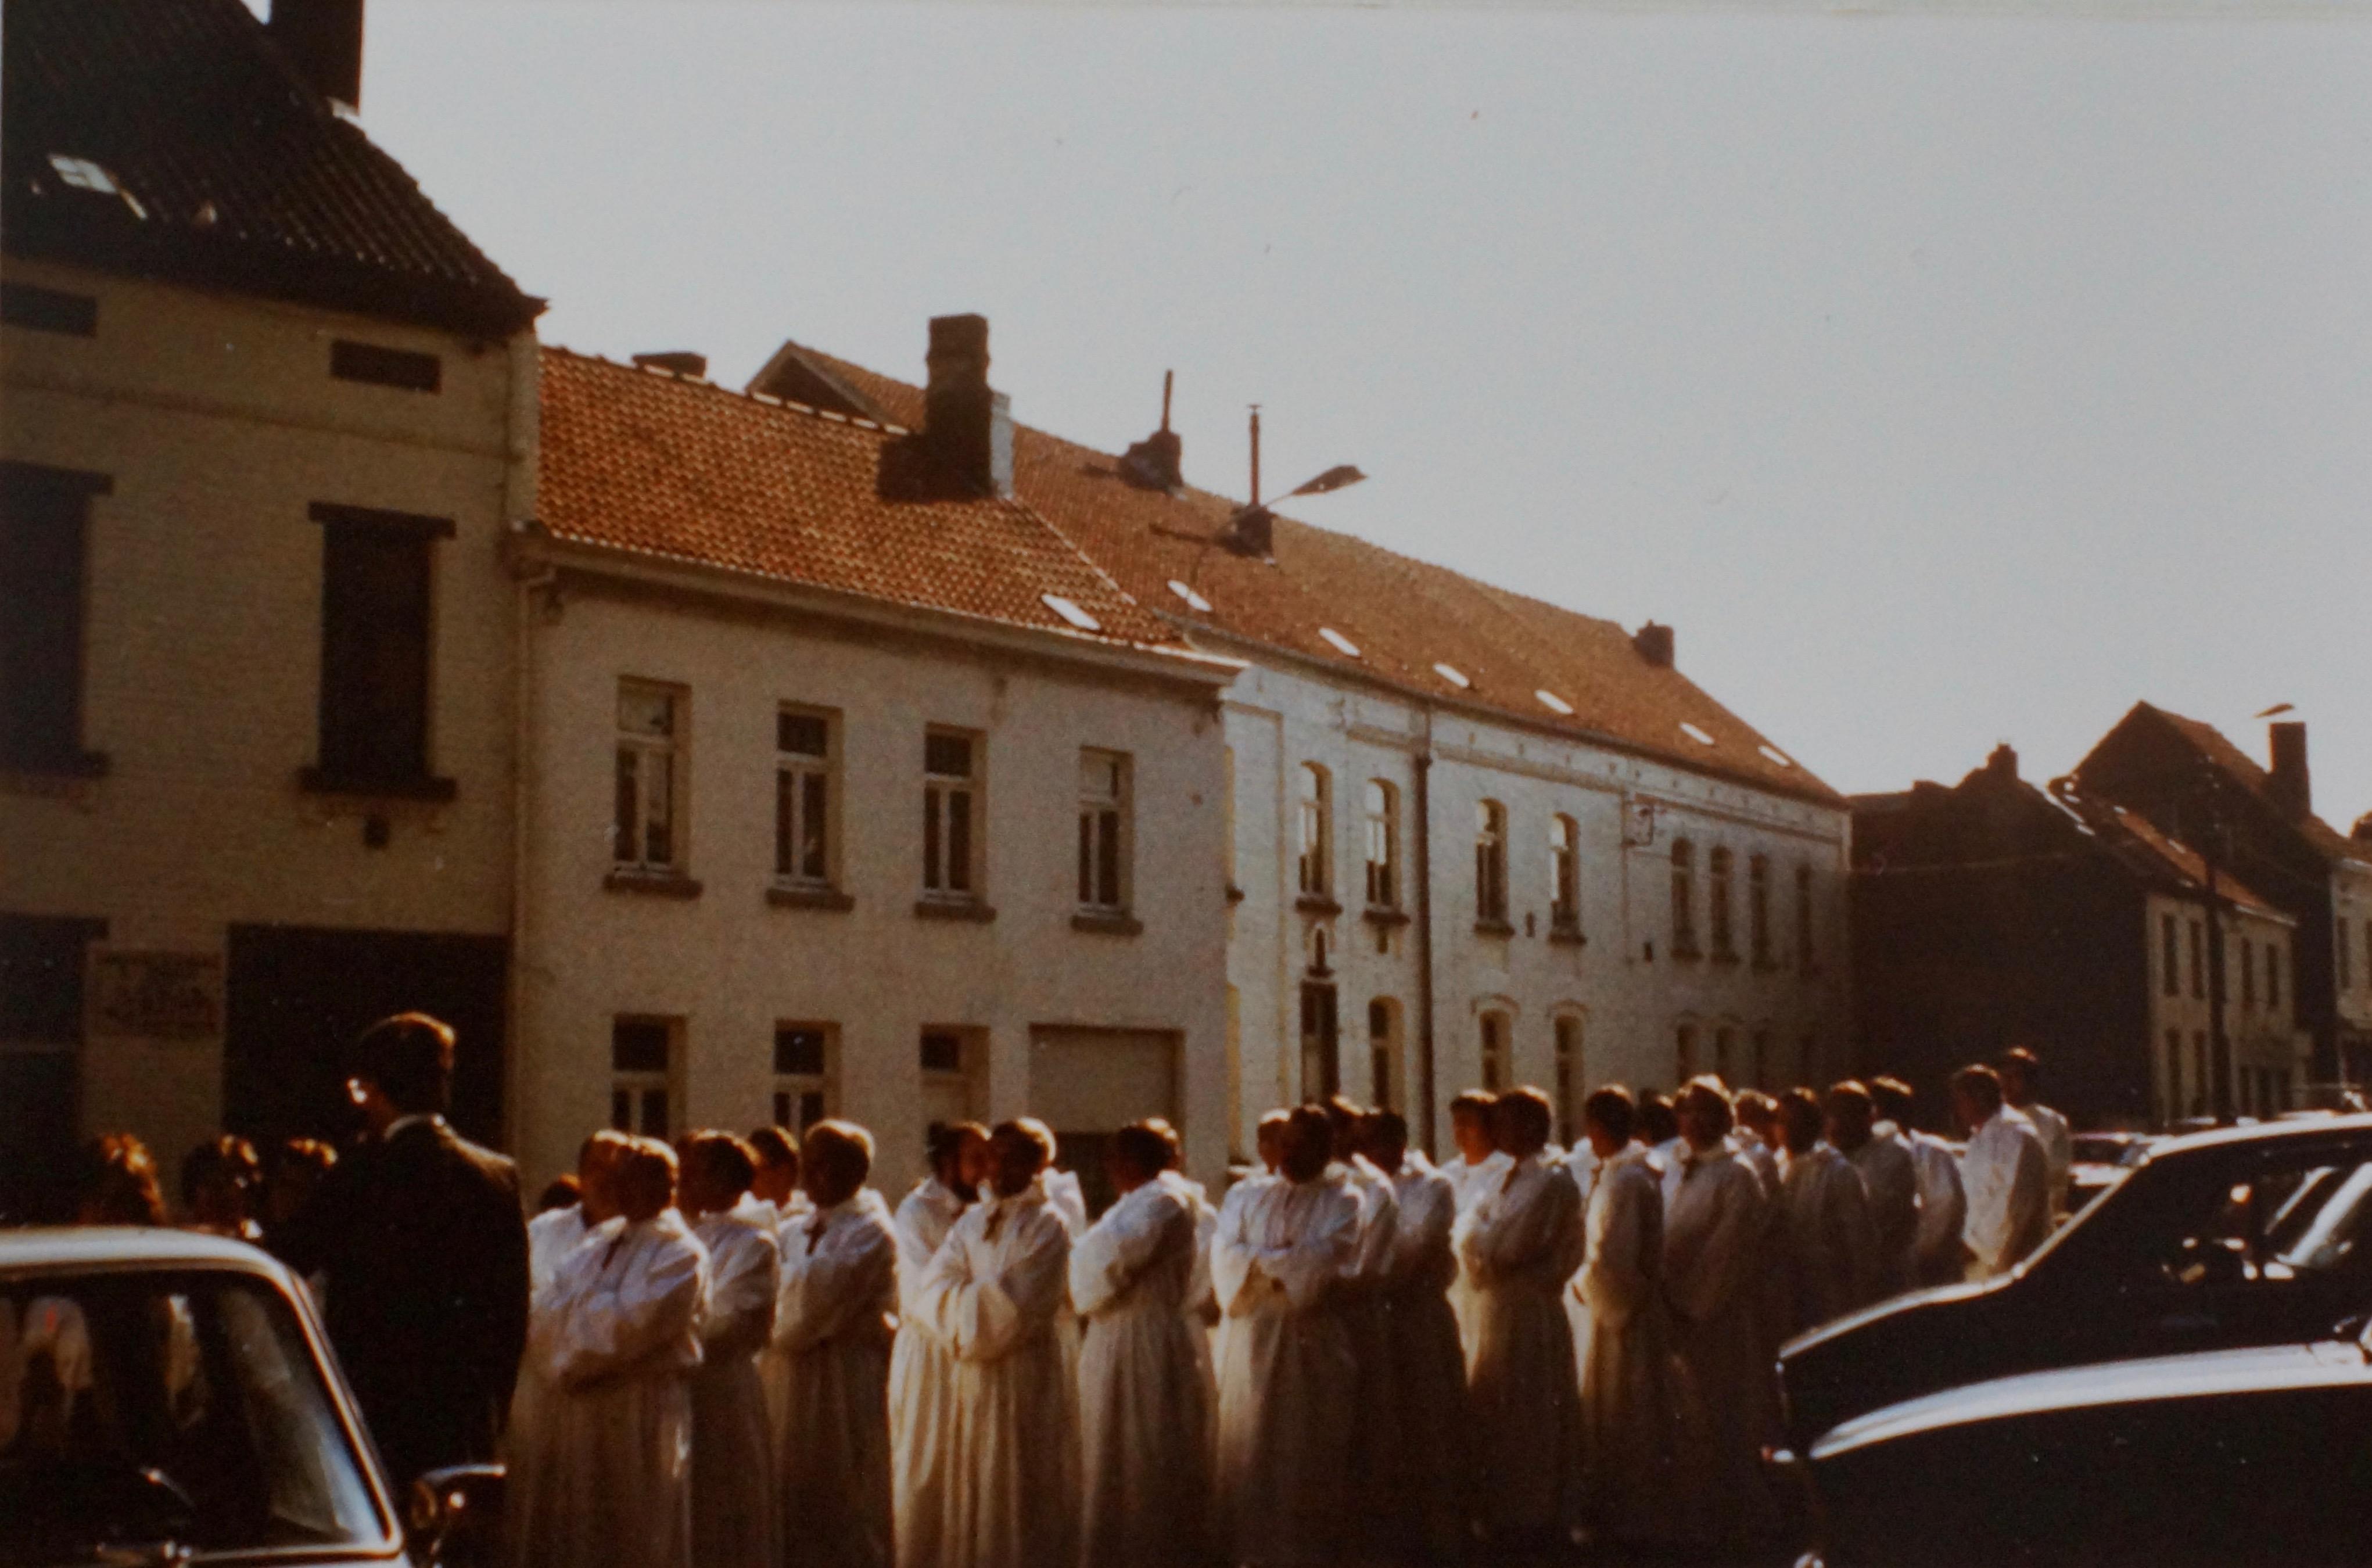 1982 Cinquantenaire de la Chorale de Bourgeois coll. Philippe Sterckx 2